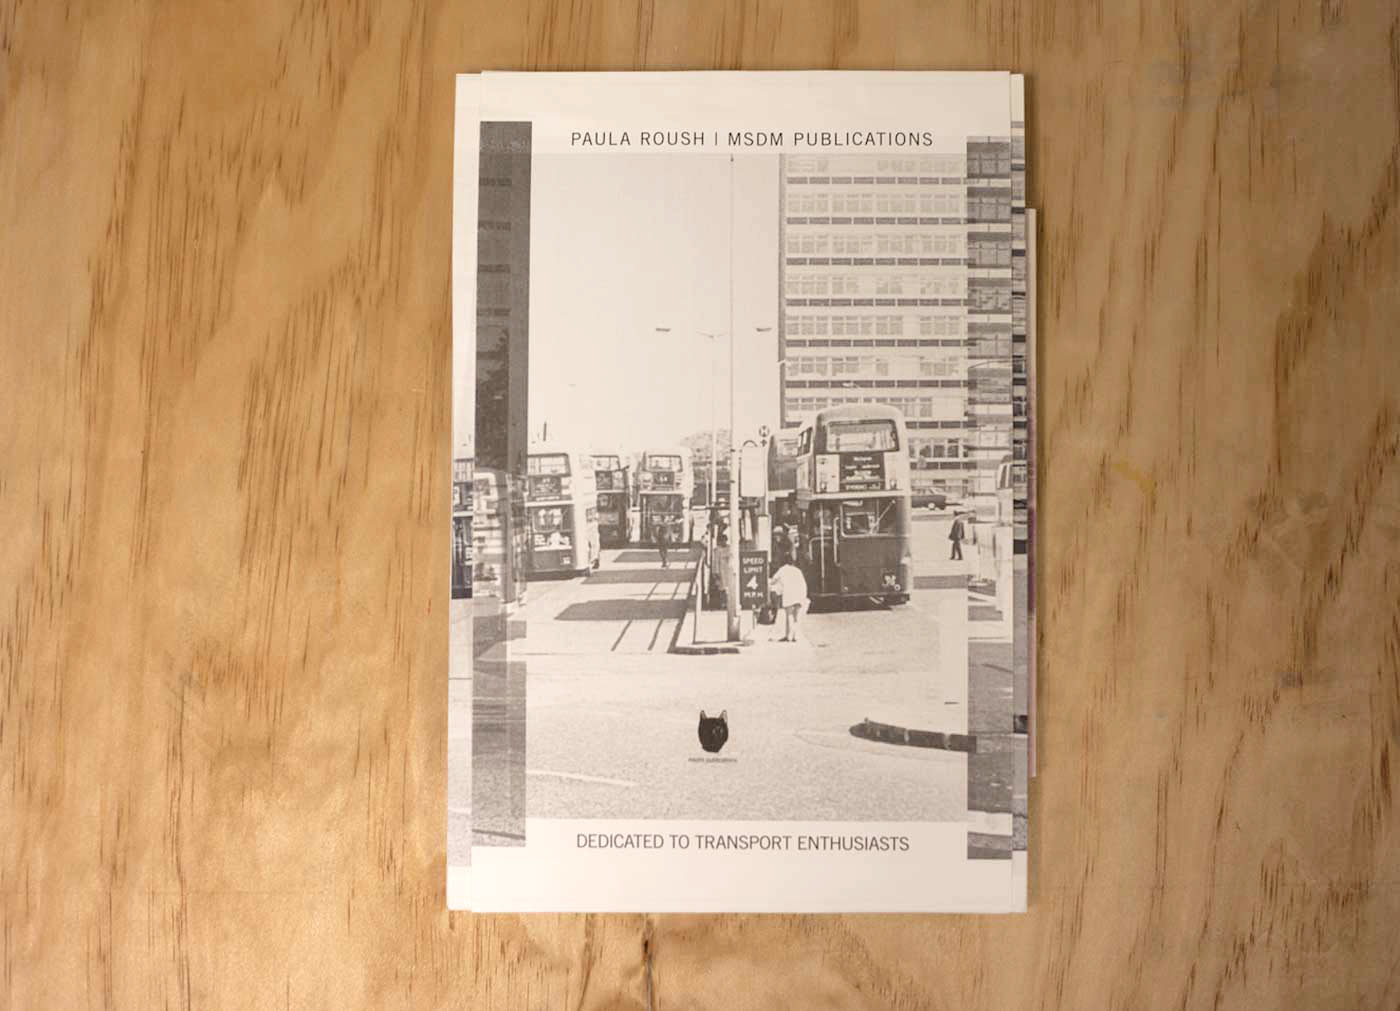 paula-roush-bus-spotting-photobook-msdm-publications-orphan1-145